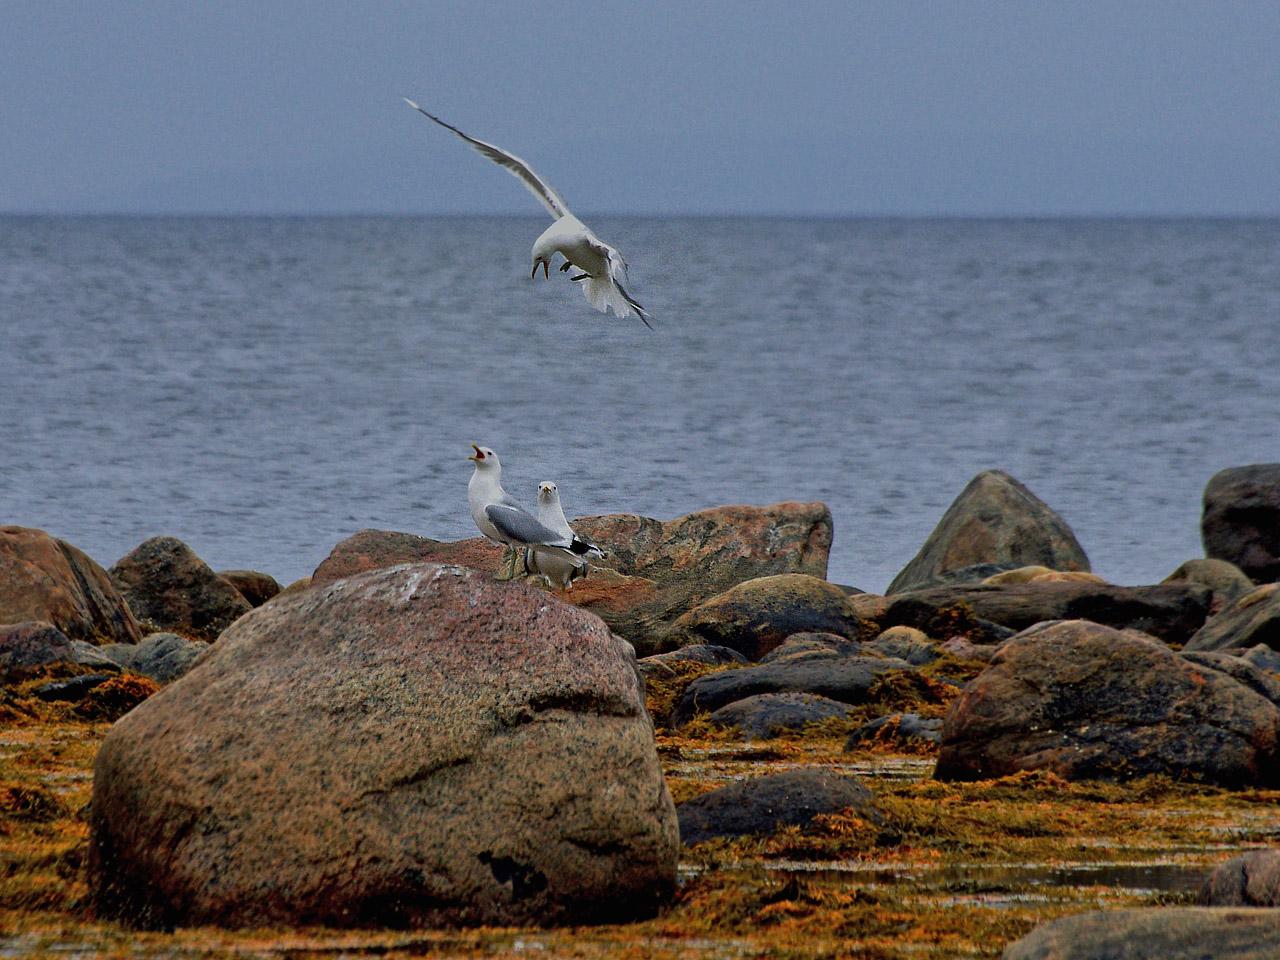 Сизая чайка (Larus canus). Автор фото: Юрий Семенов